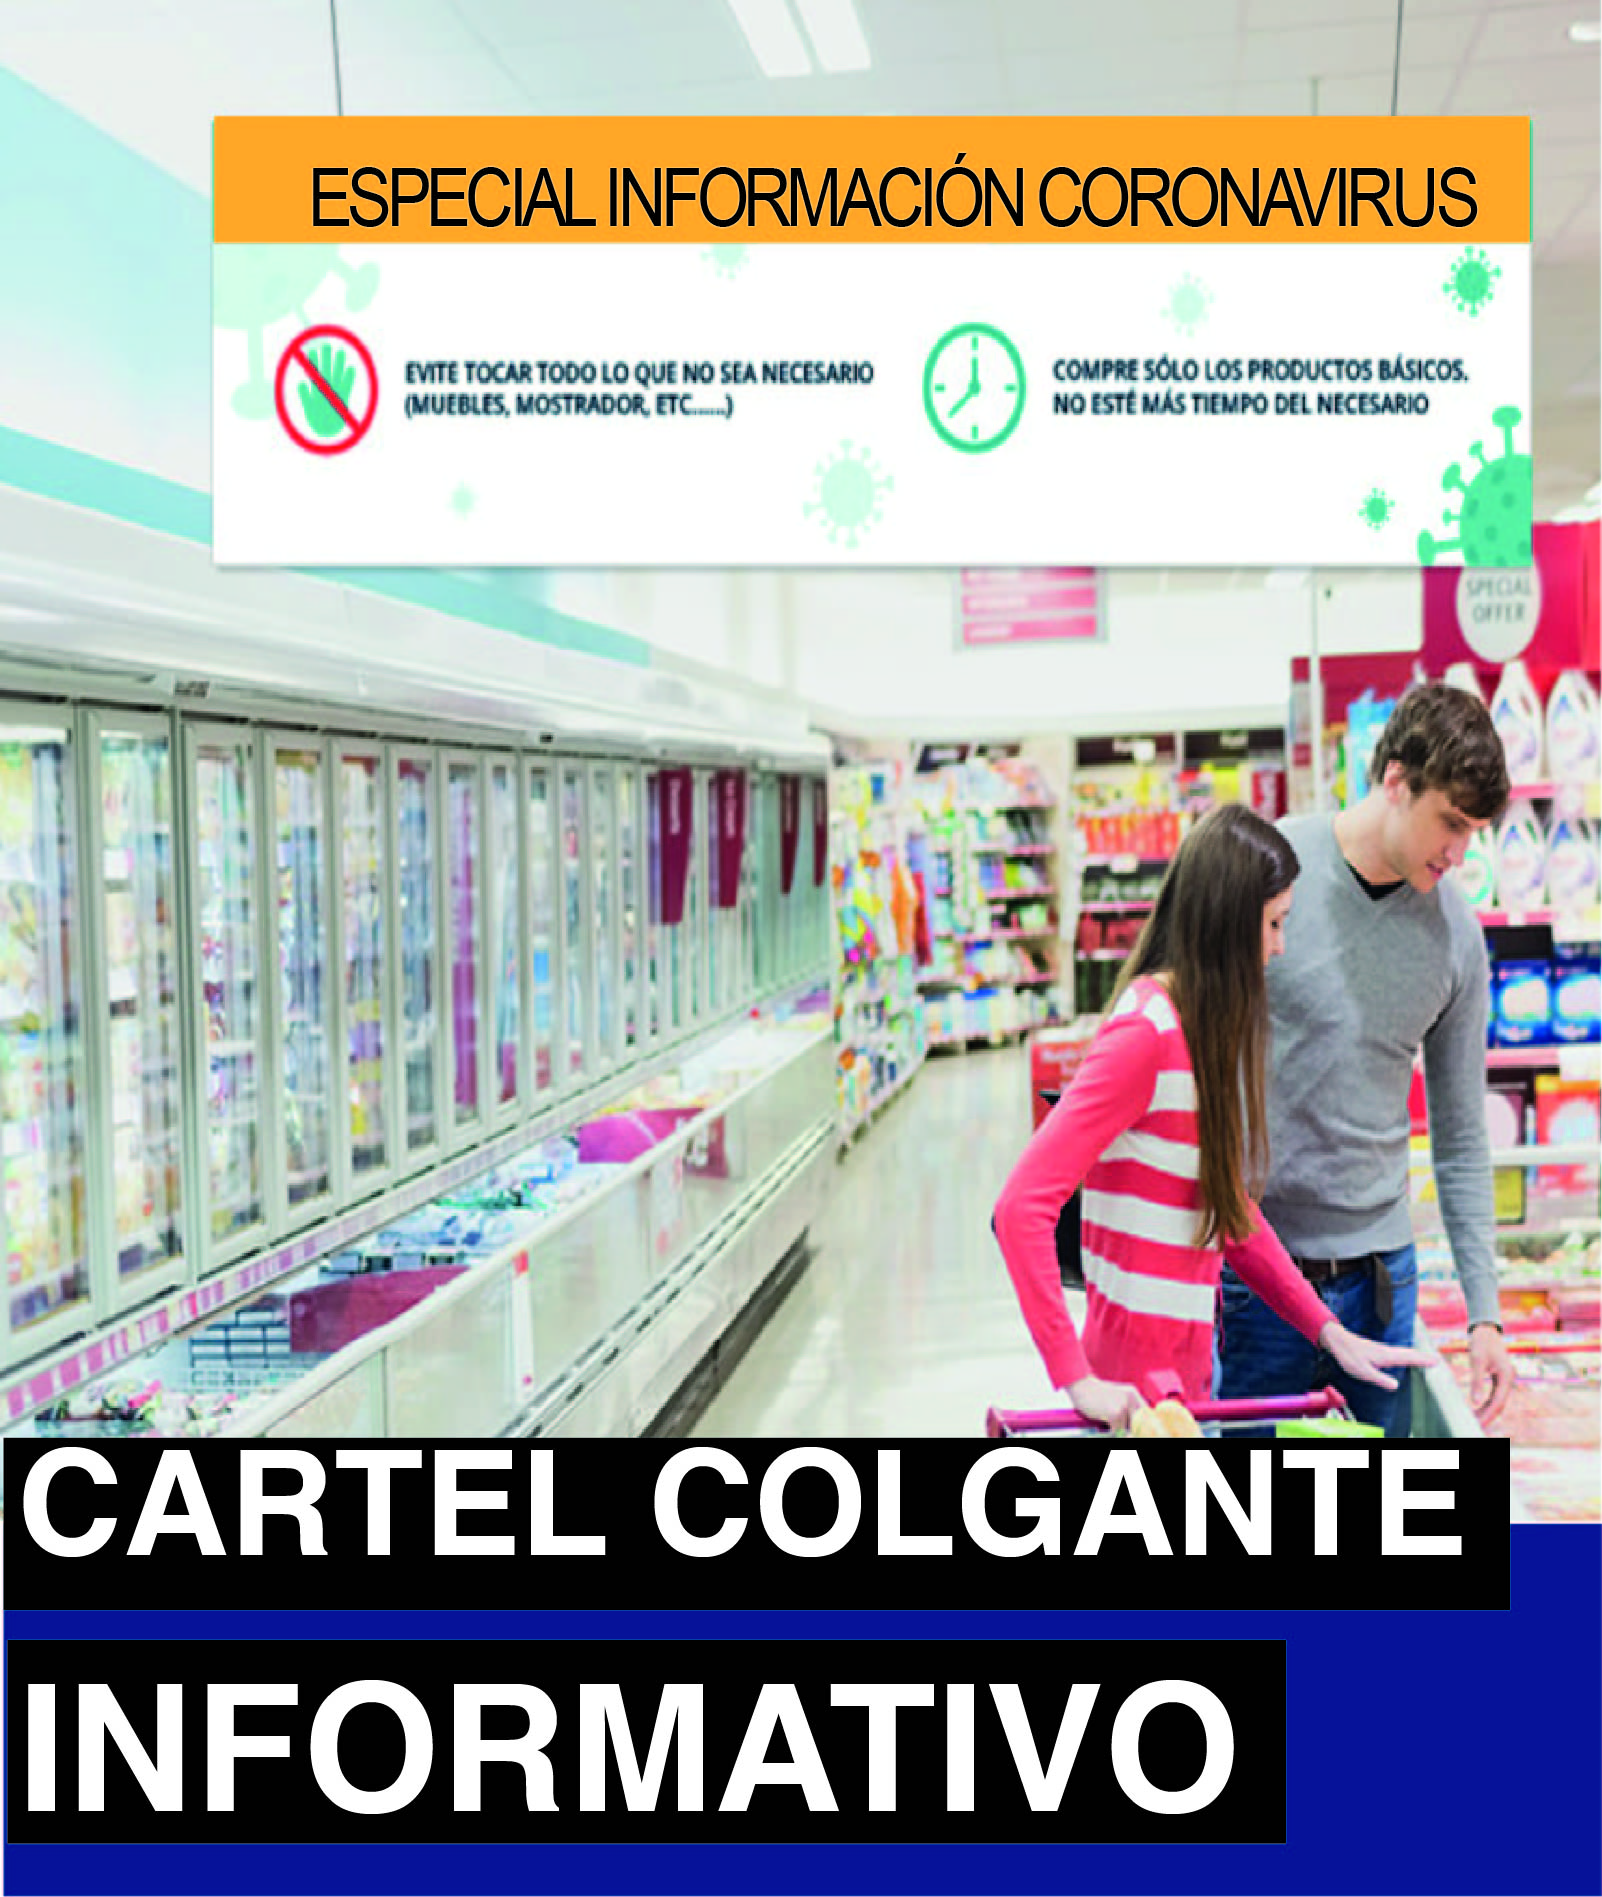 cartel colgante-informacion-covid19-talentomarketongsolutions